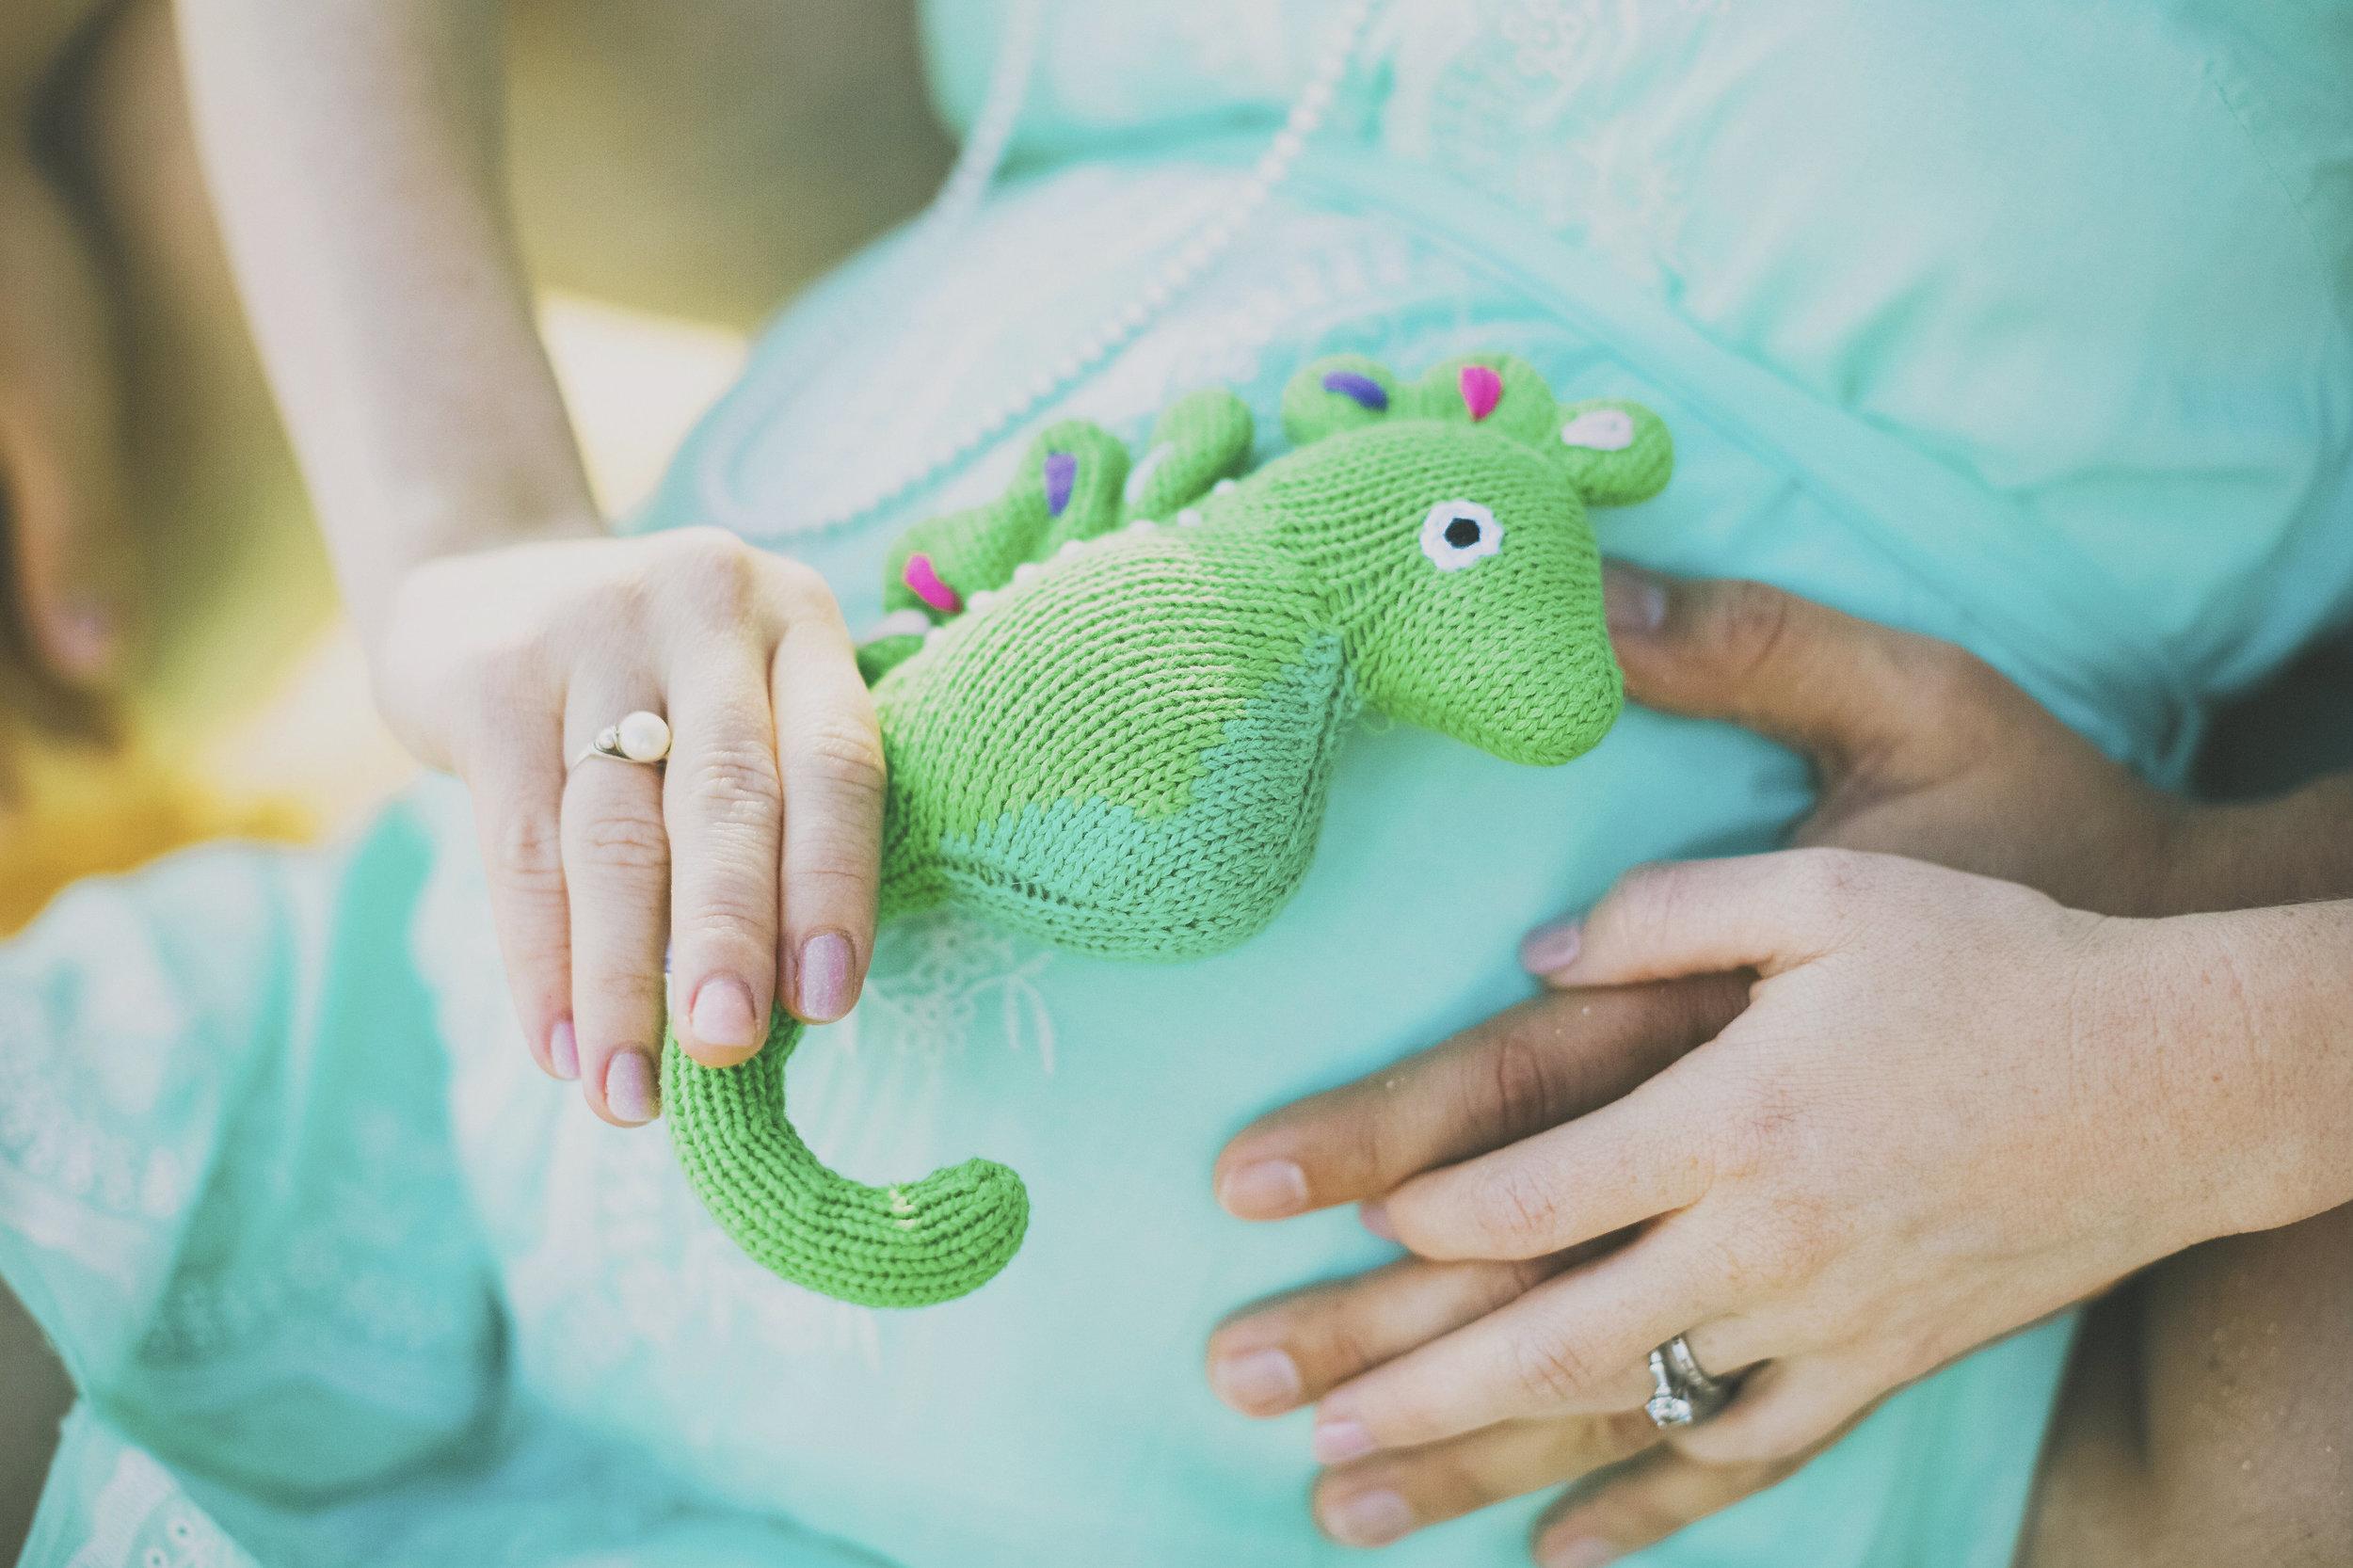 angie-diaz-photography-maui-maternity-jill-10.jpg